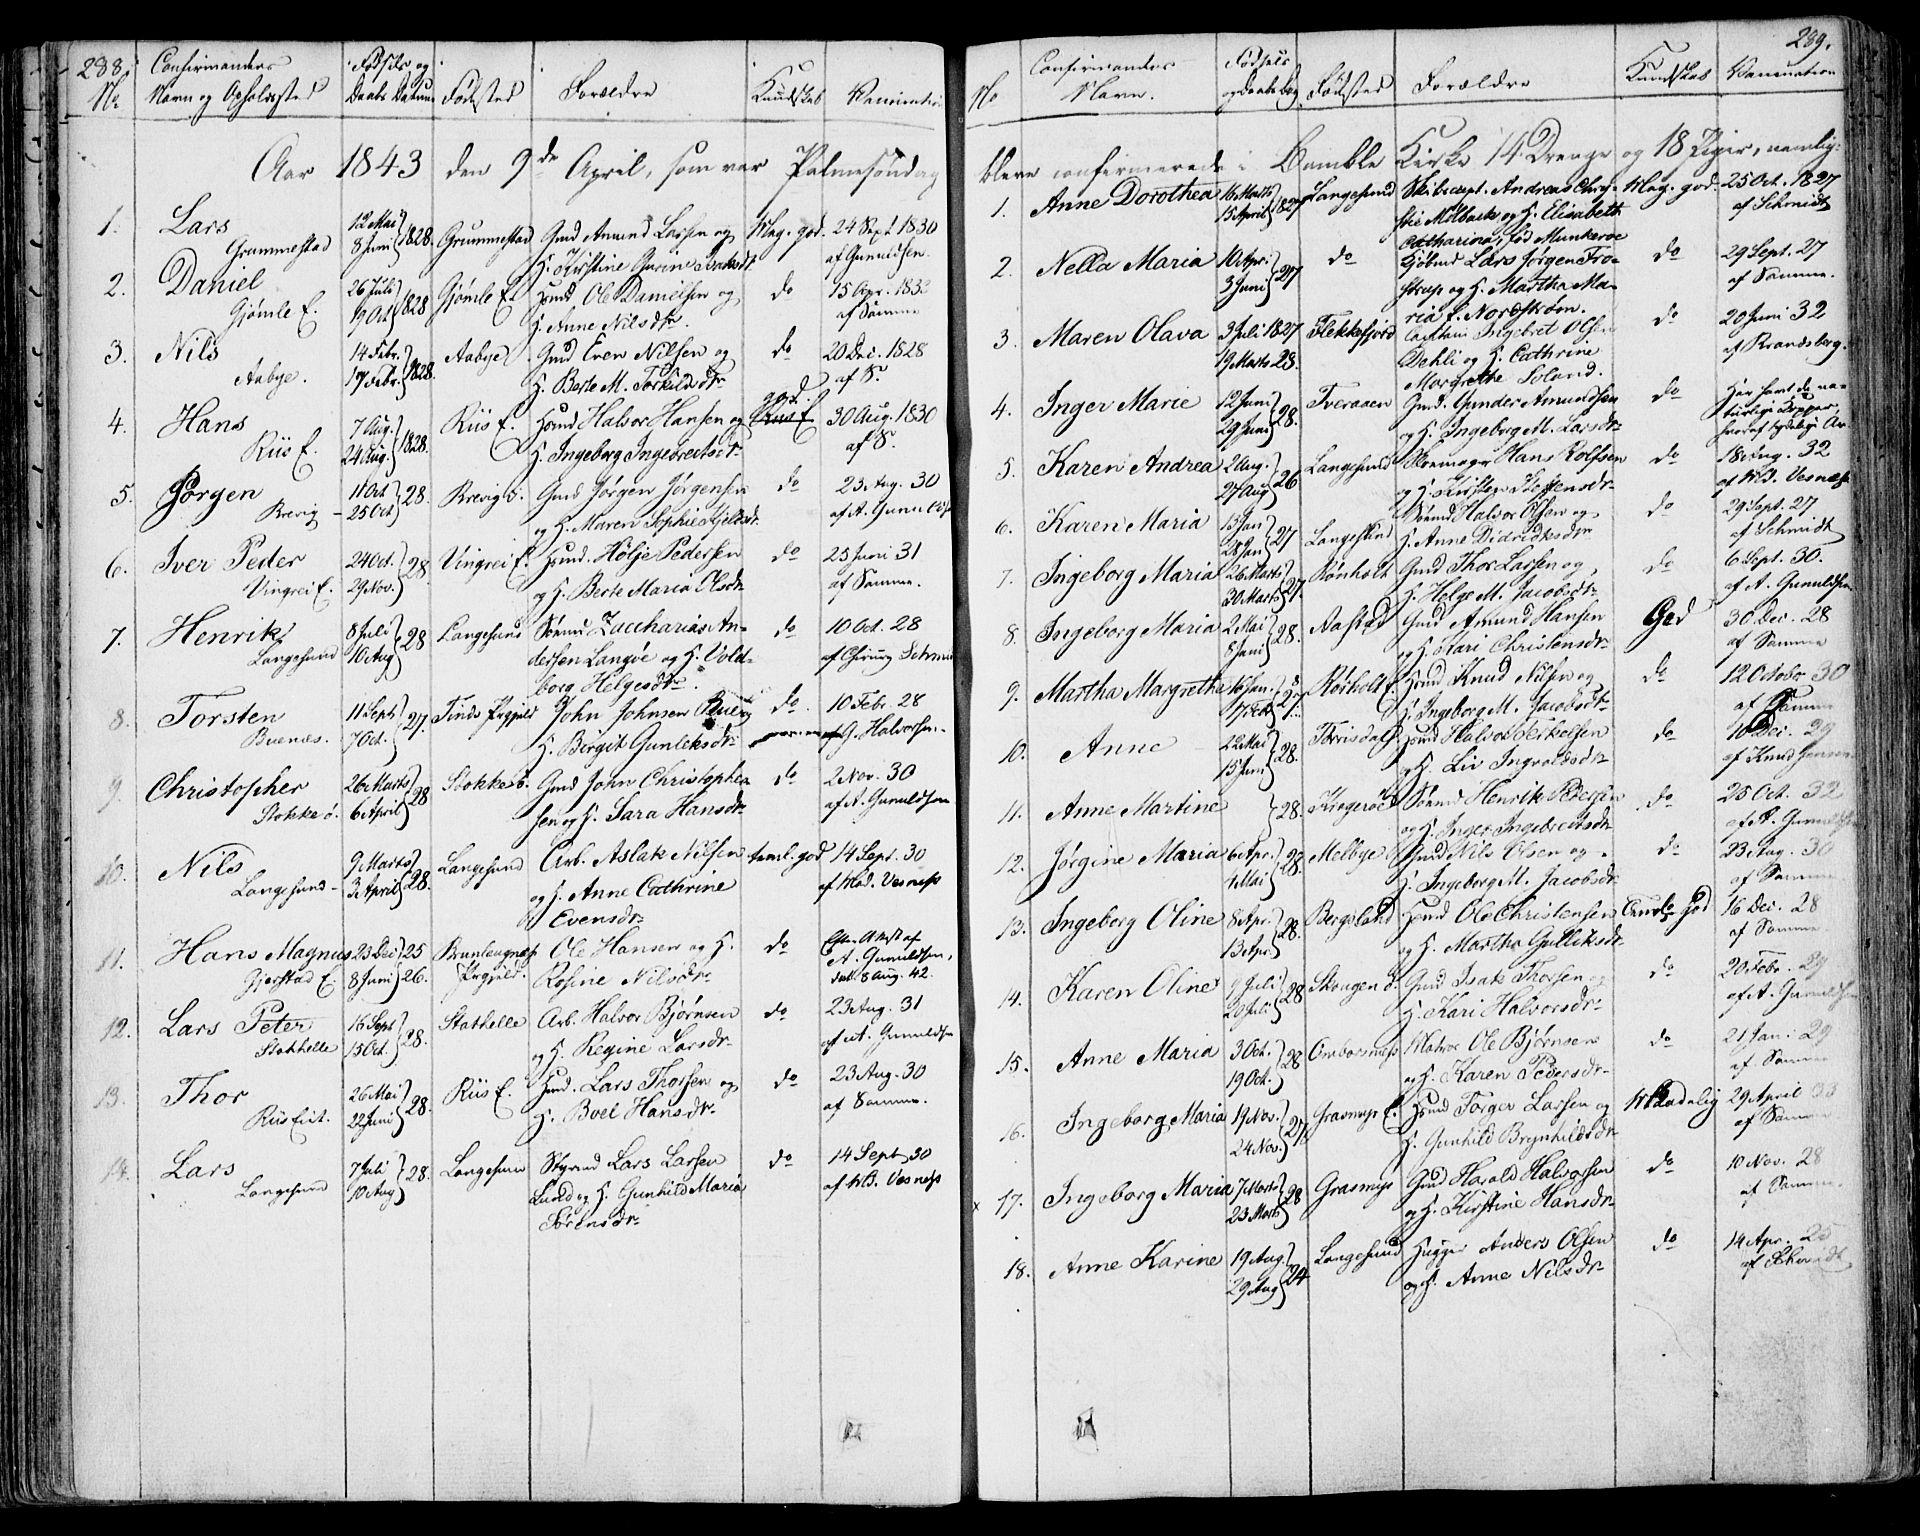 SAKO, Bamble kirkebøker, F/Fa/L0004: Ministerialbok nr. I 4, 1834-1853, s. 288-289